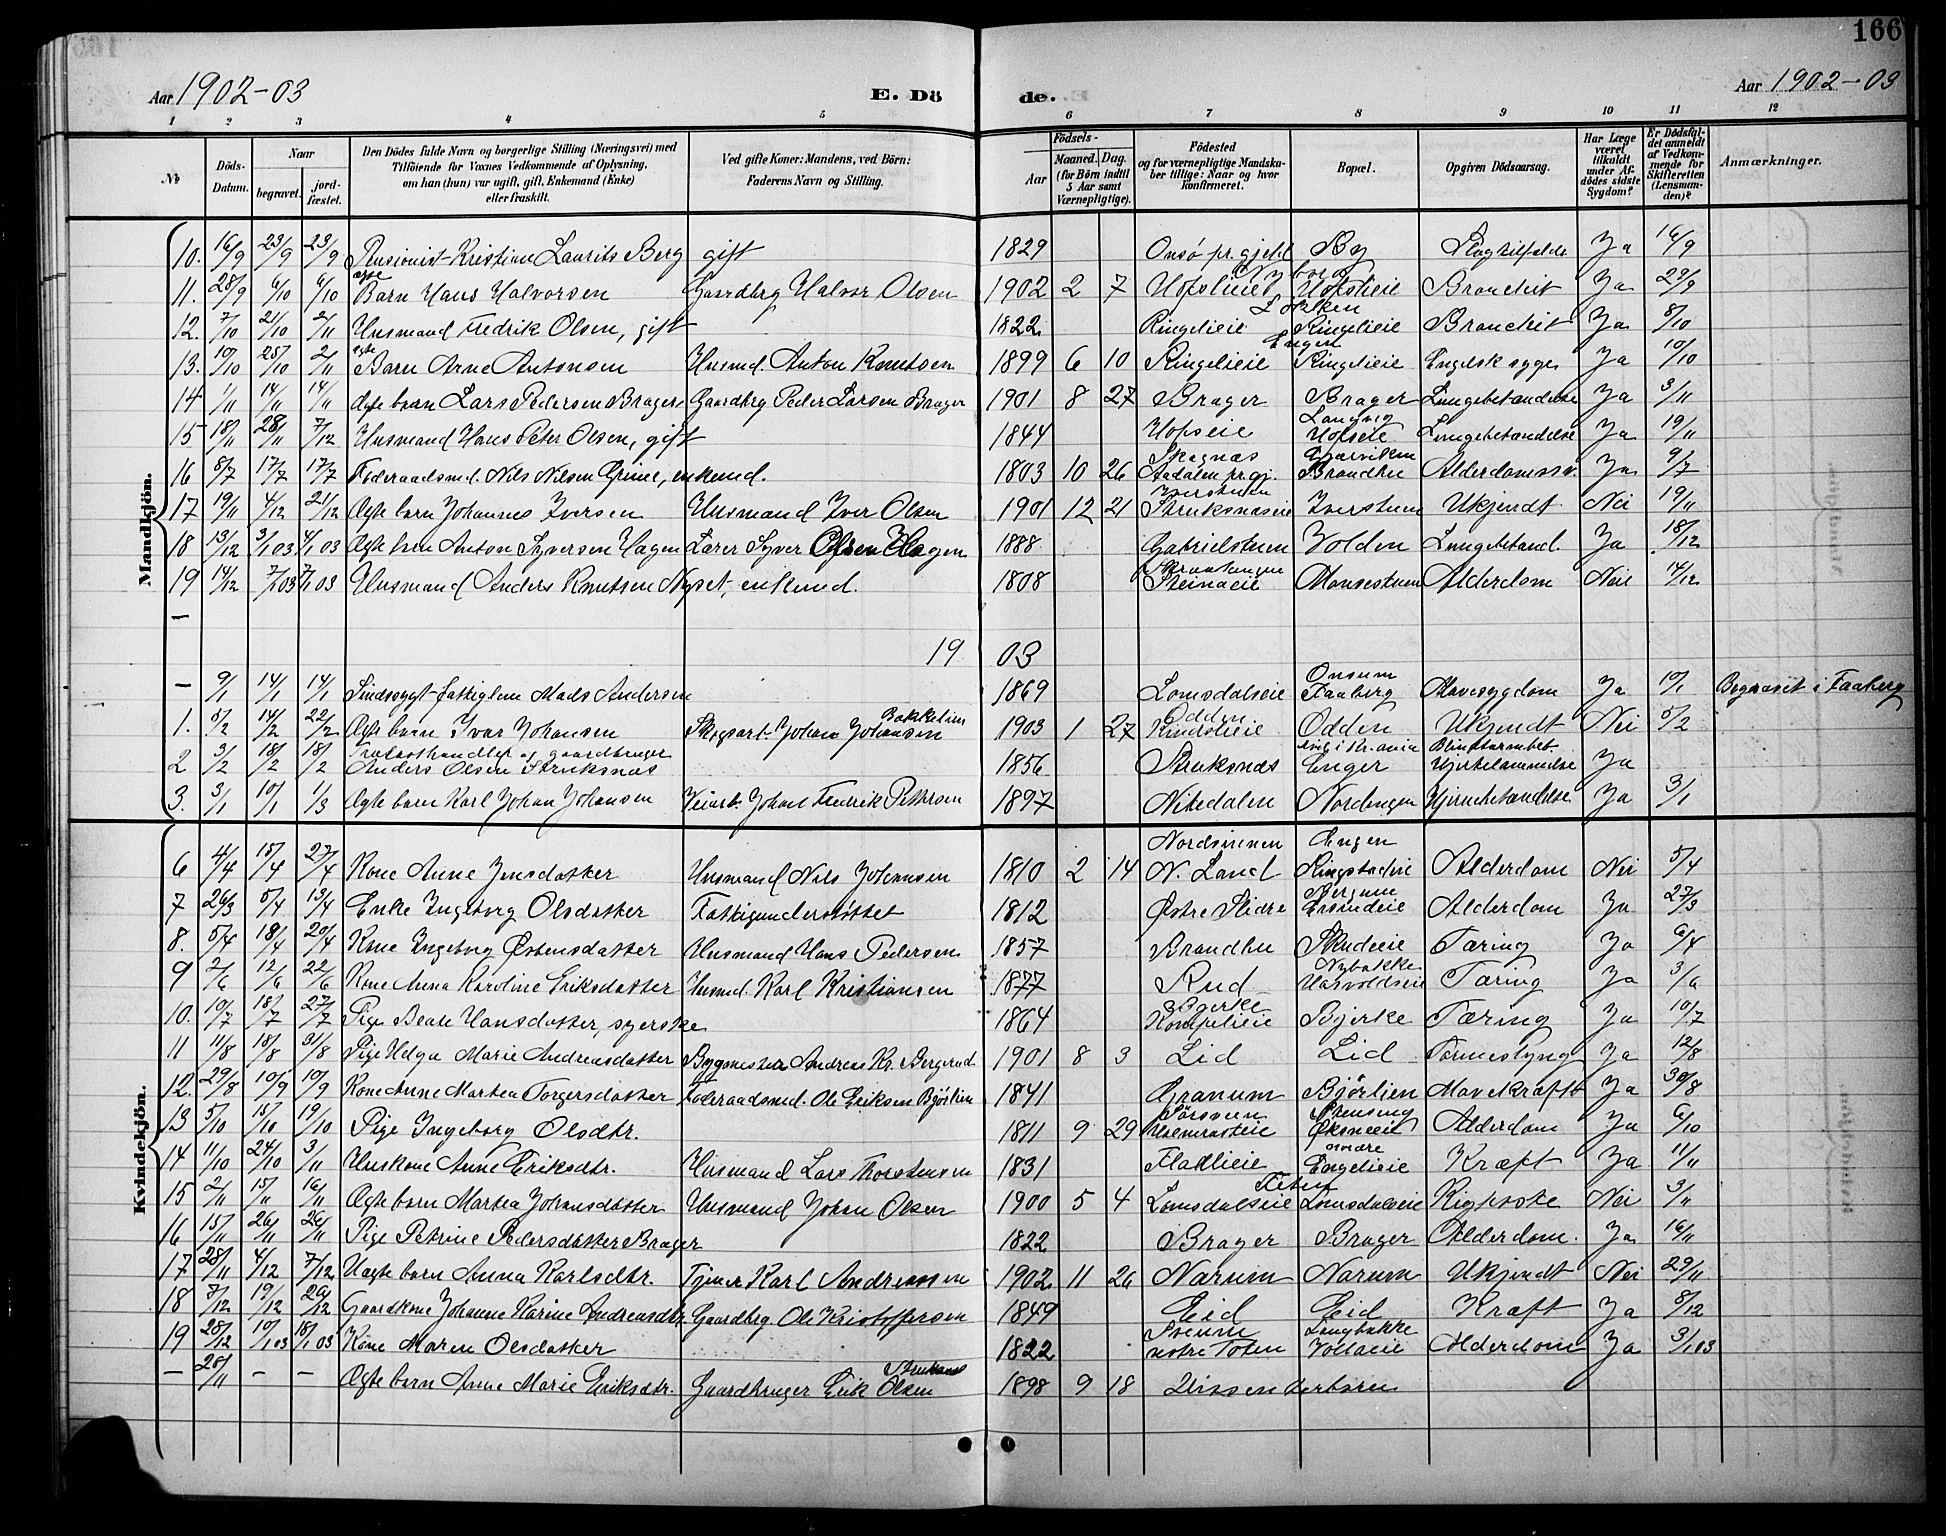 SAH, Søndre Land prestekontor, L/L0004: Klokkerbok nr. 4, 1901-1915, s. 166